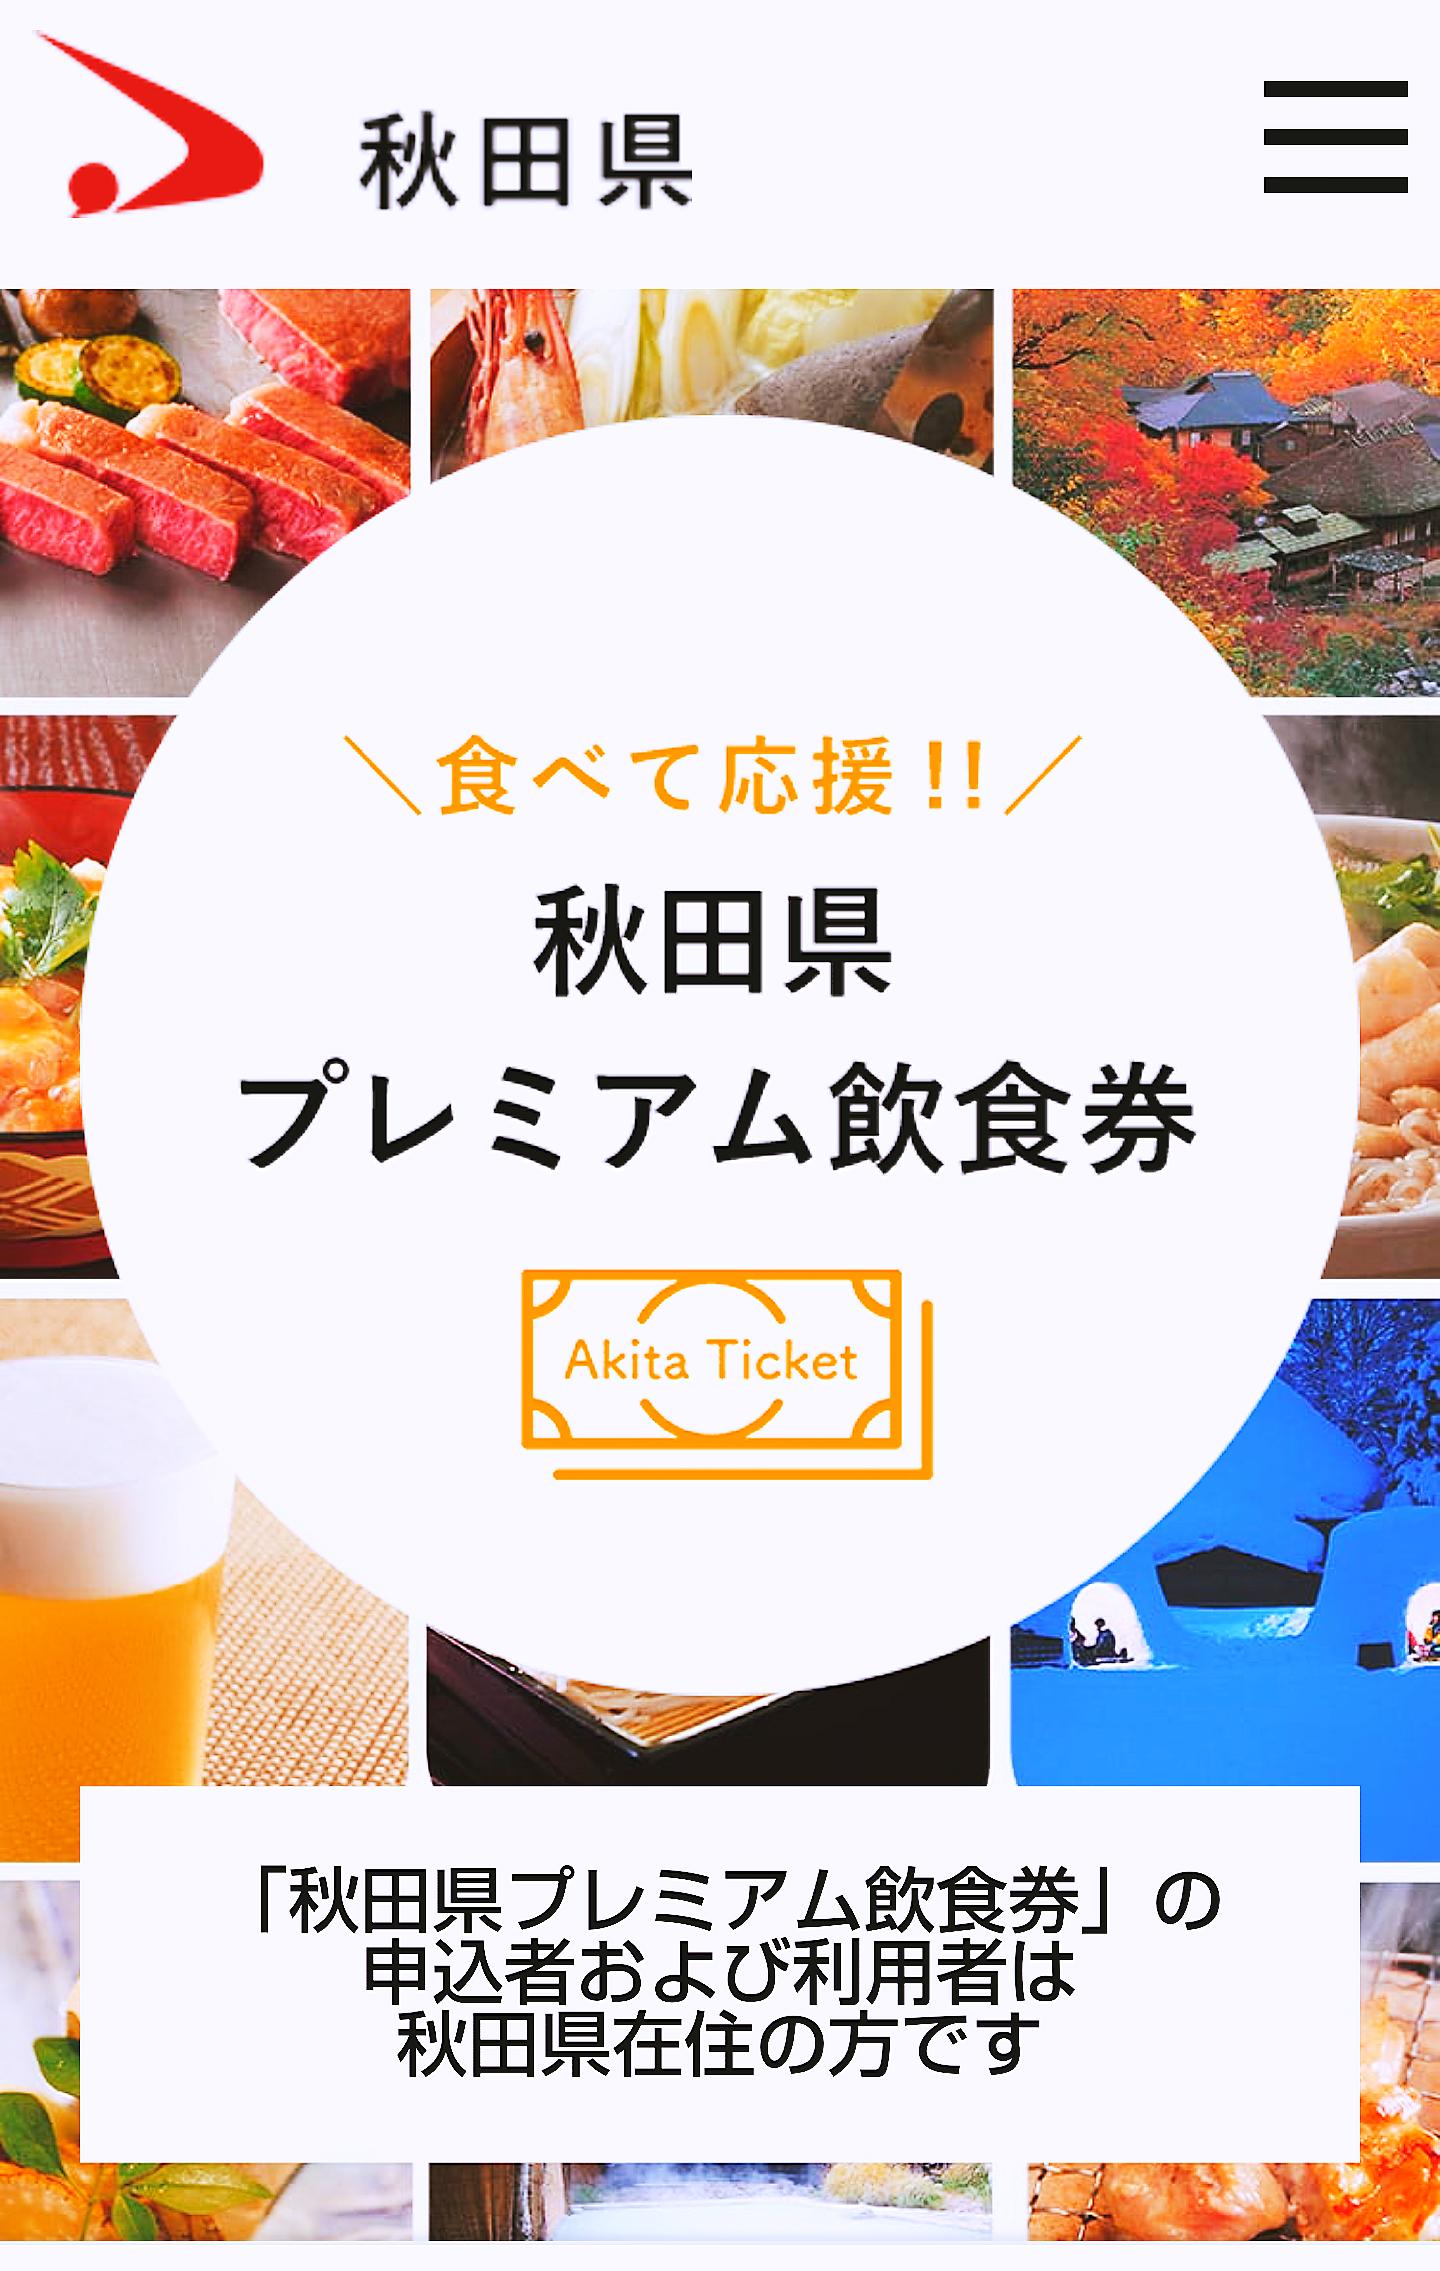 http://www.fukukomachi.com/blog/photo/C360_2020-06-12-10-36-23-316.png